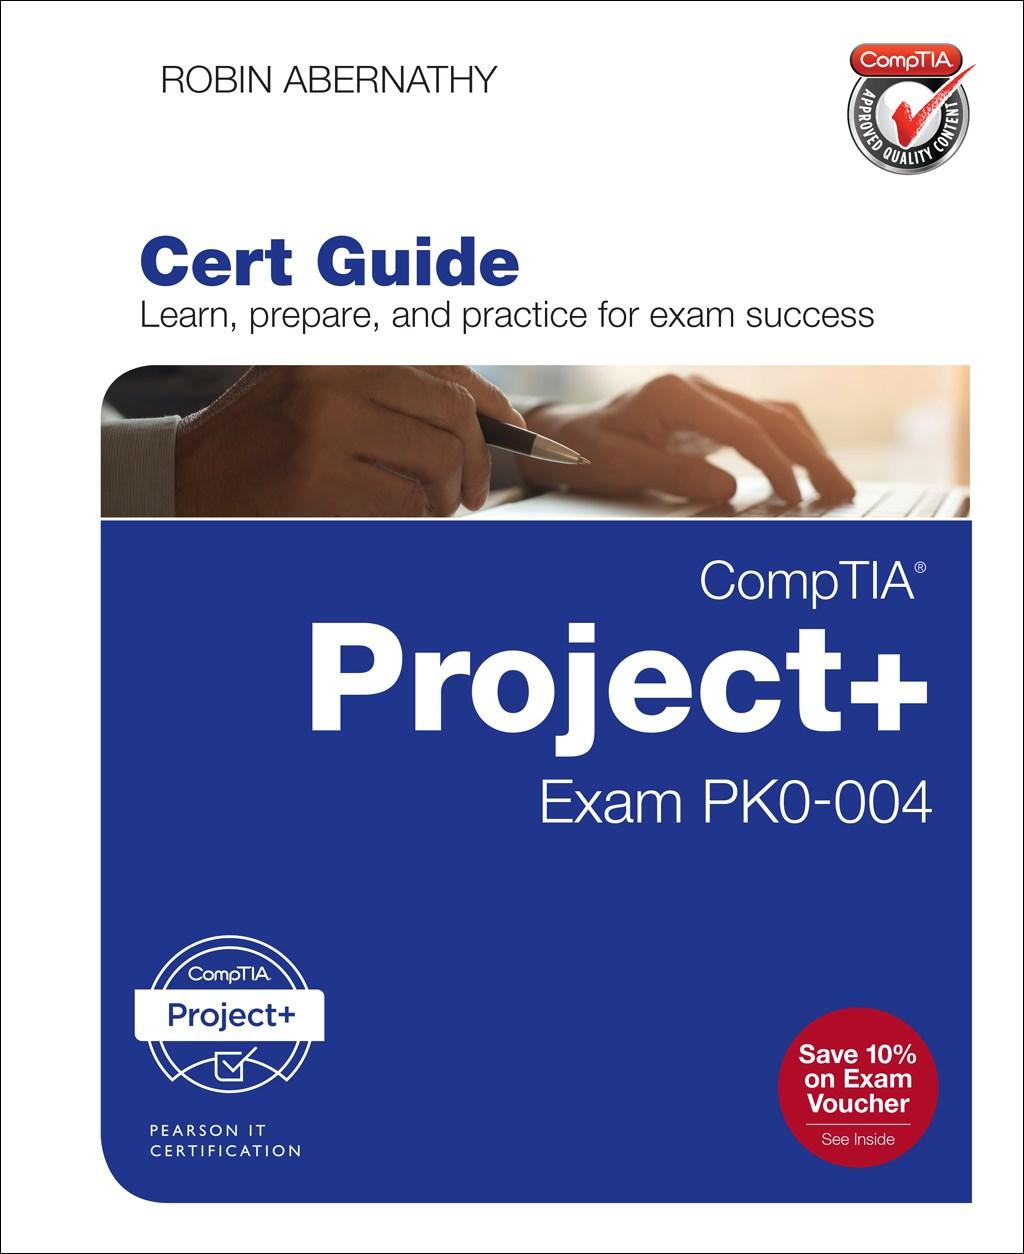 comptia pk0 cert exam pearson certification hardcover wish edition robin